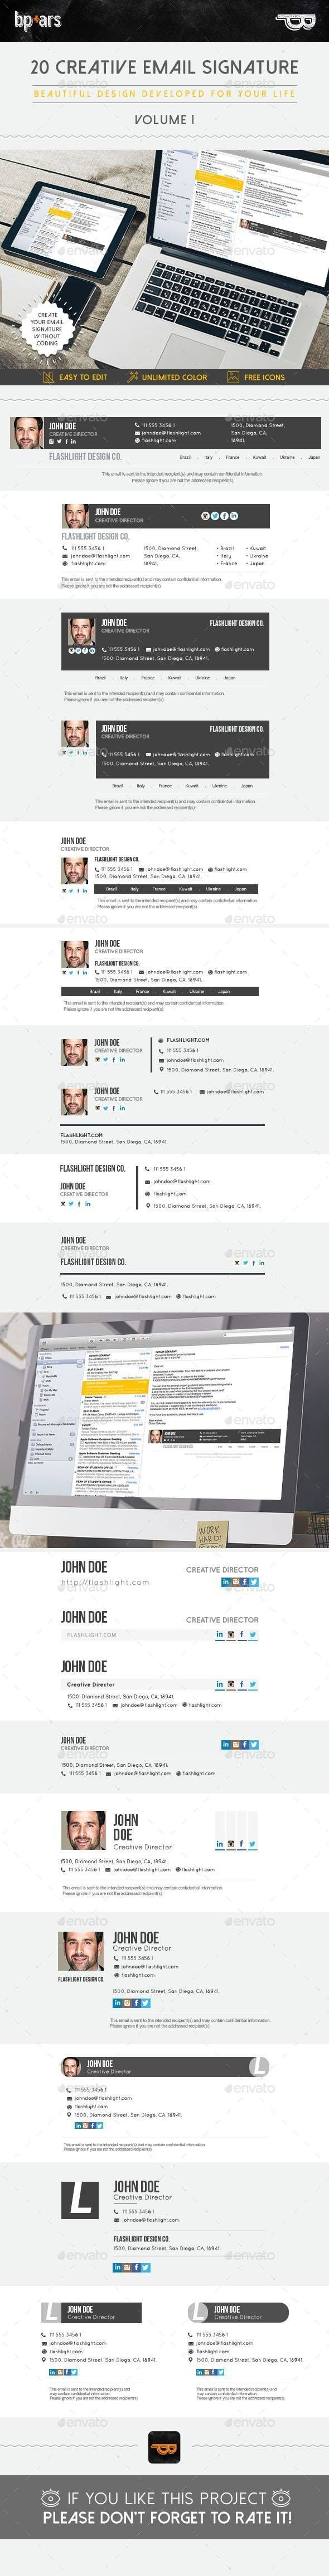 20 Email Signature Affiliate Email, Sponsored,